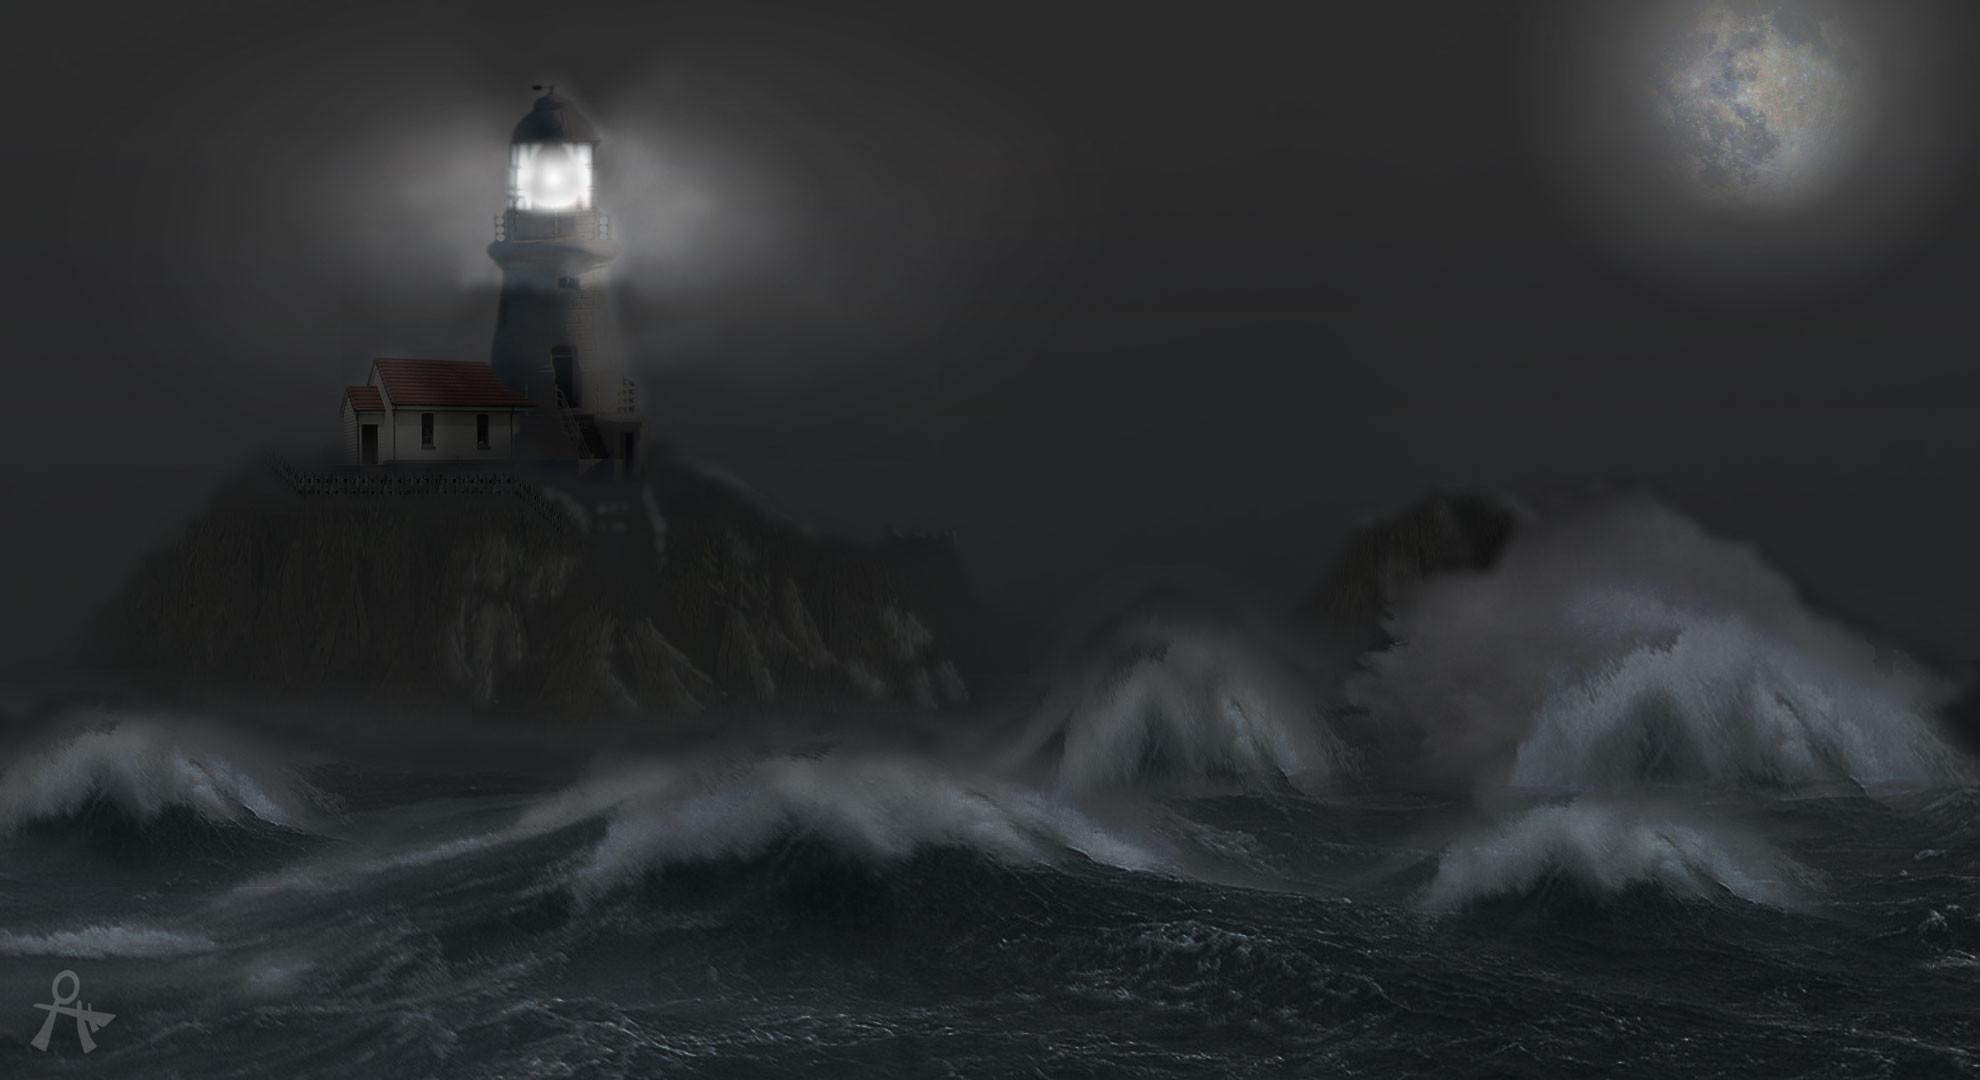 Stormy Lighthouse Wallpaper   wallpaper, wallpaper hd, background .